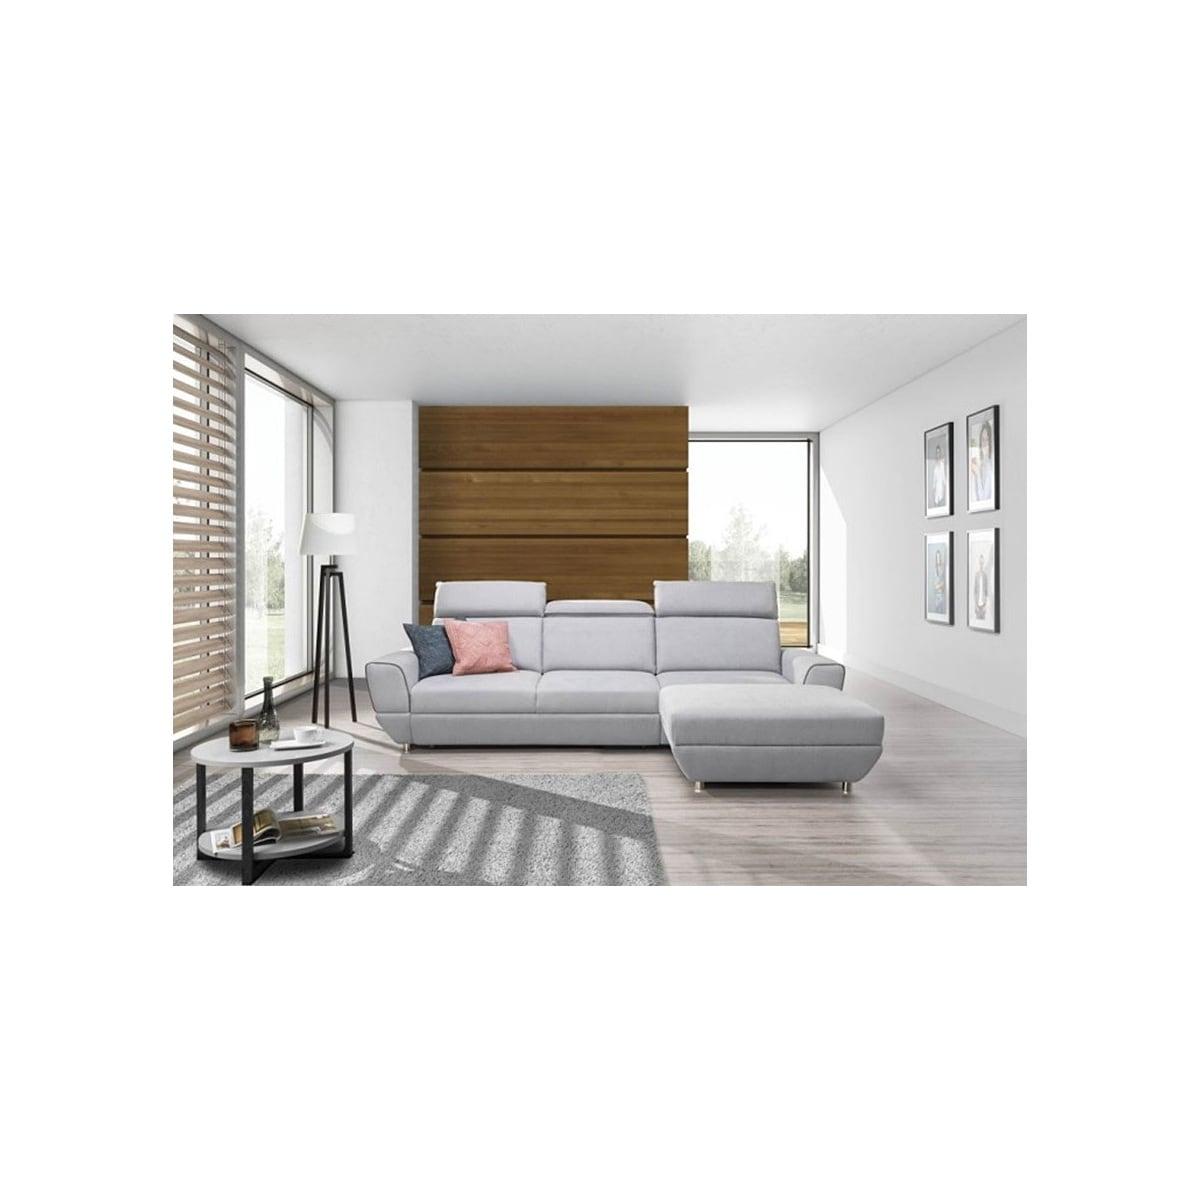 Phill hill polsterecke cozy stoffbezug grau ca 290 x 197 for Ecksofa porta